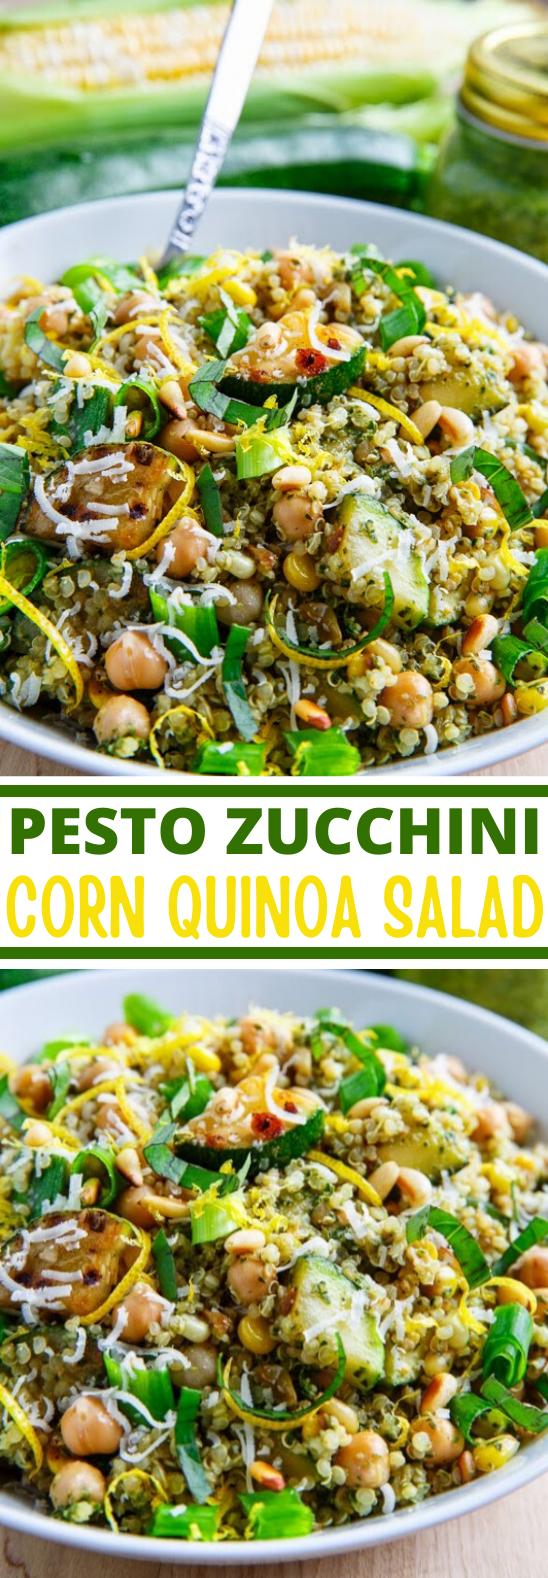 Pesto Zucchini and Corn Quinoa Salad #vegan #healthy #lunch #salad #glutenfree